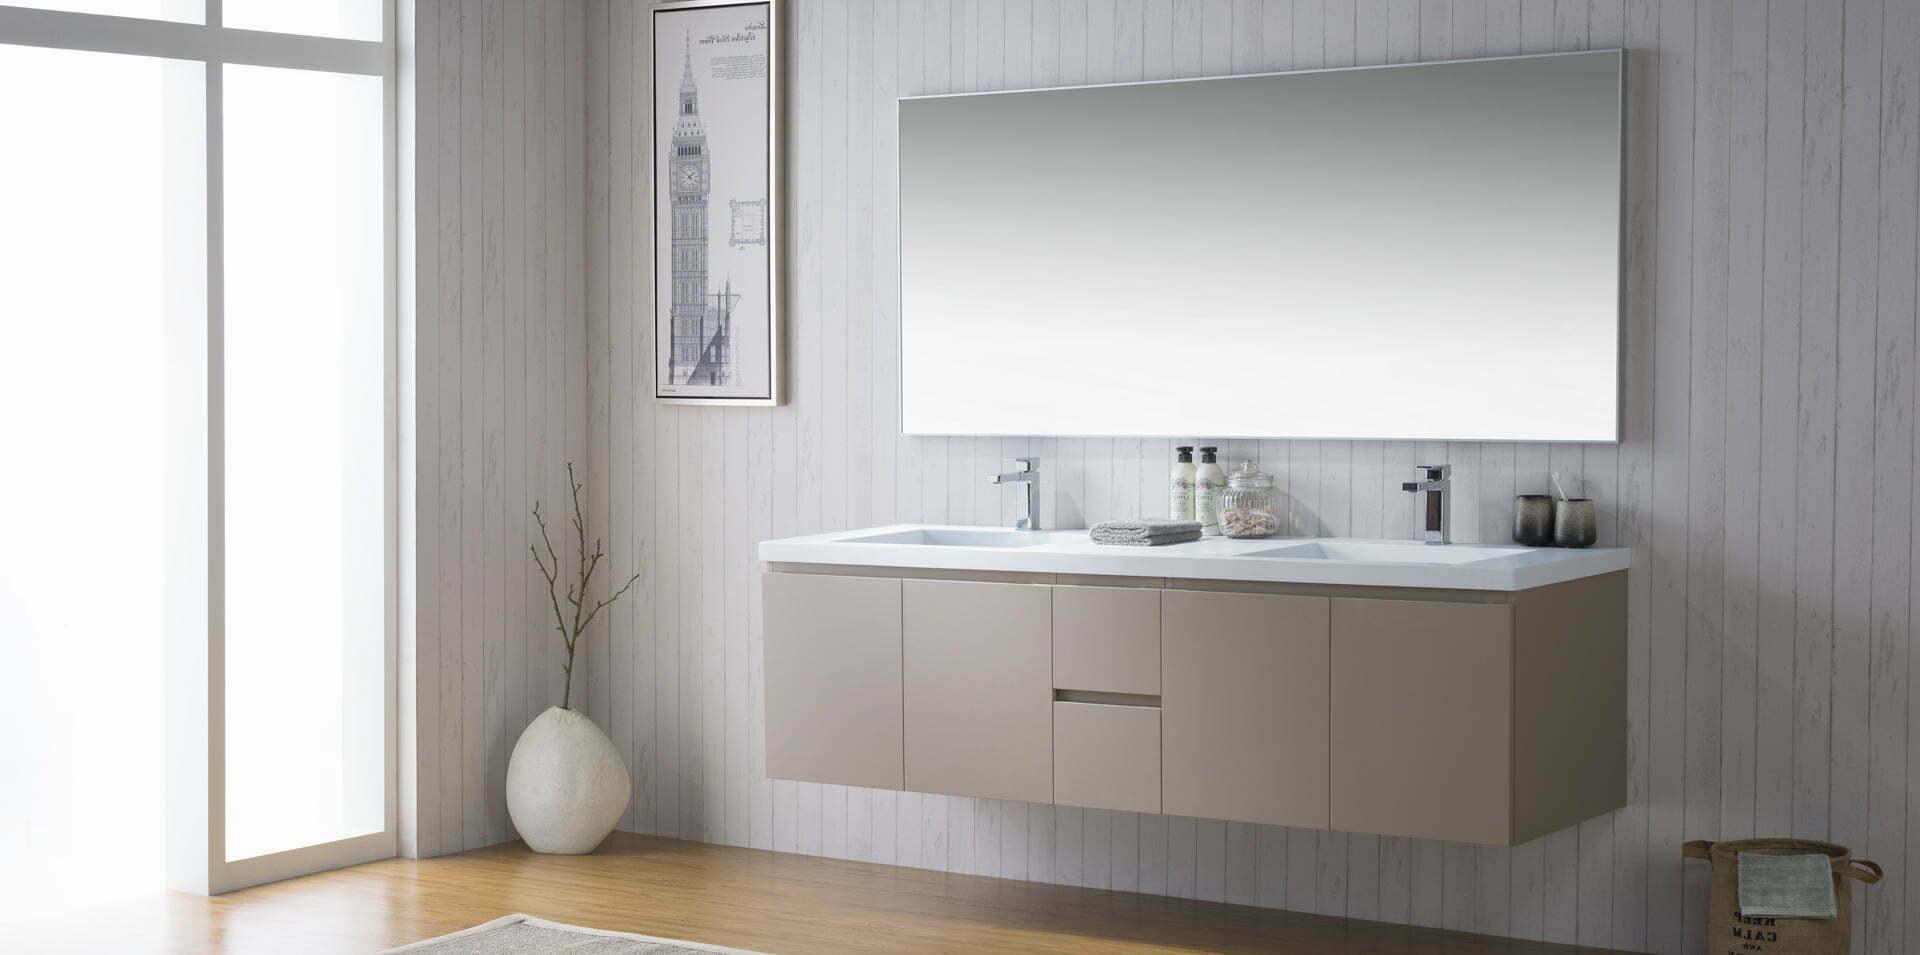 15+ Amazing Bathroom Vanity Ideas